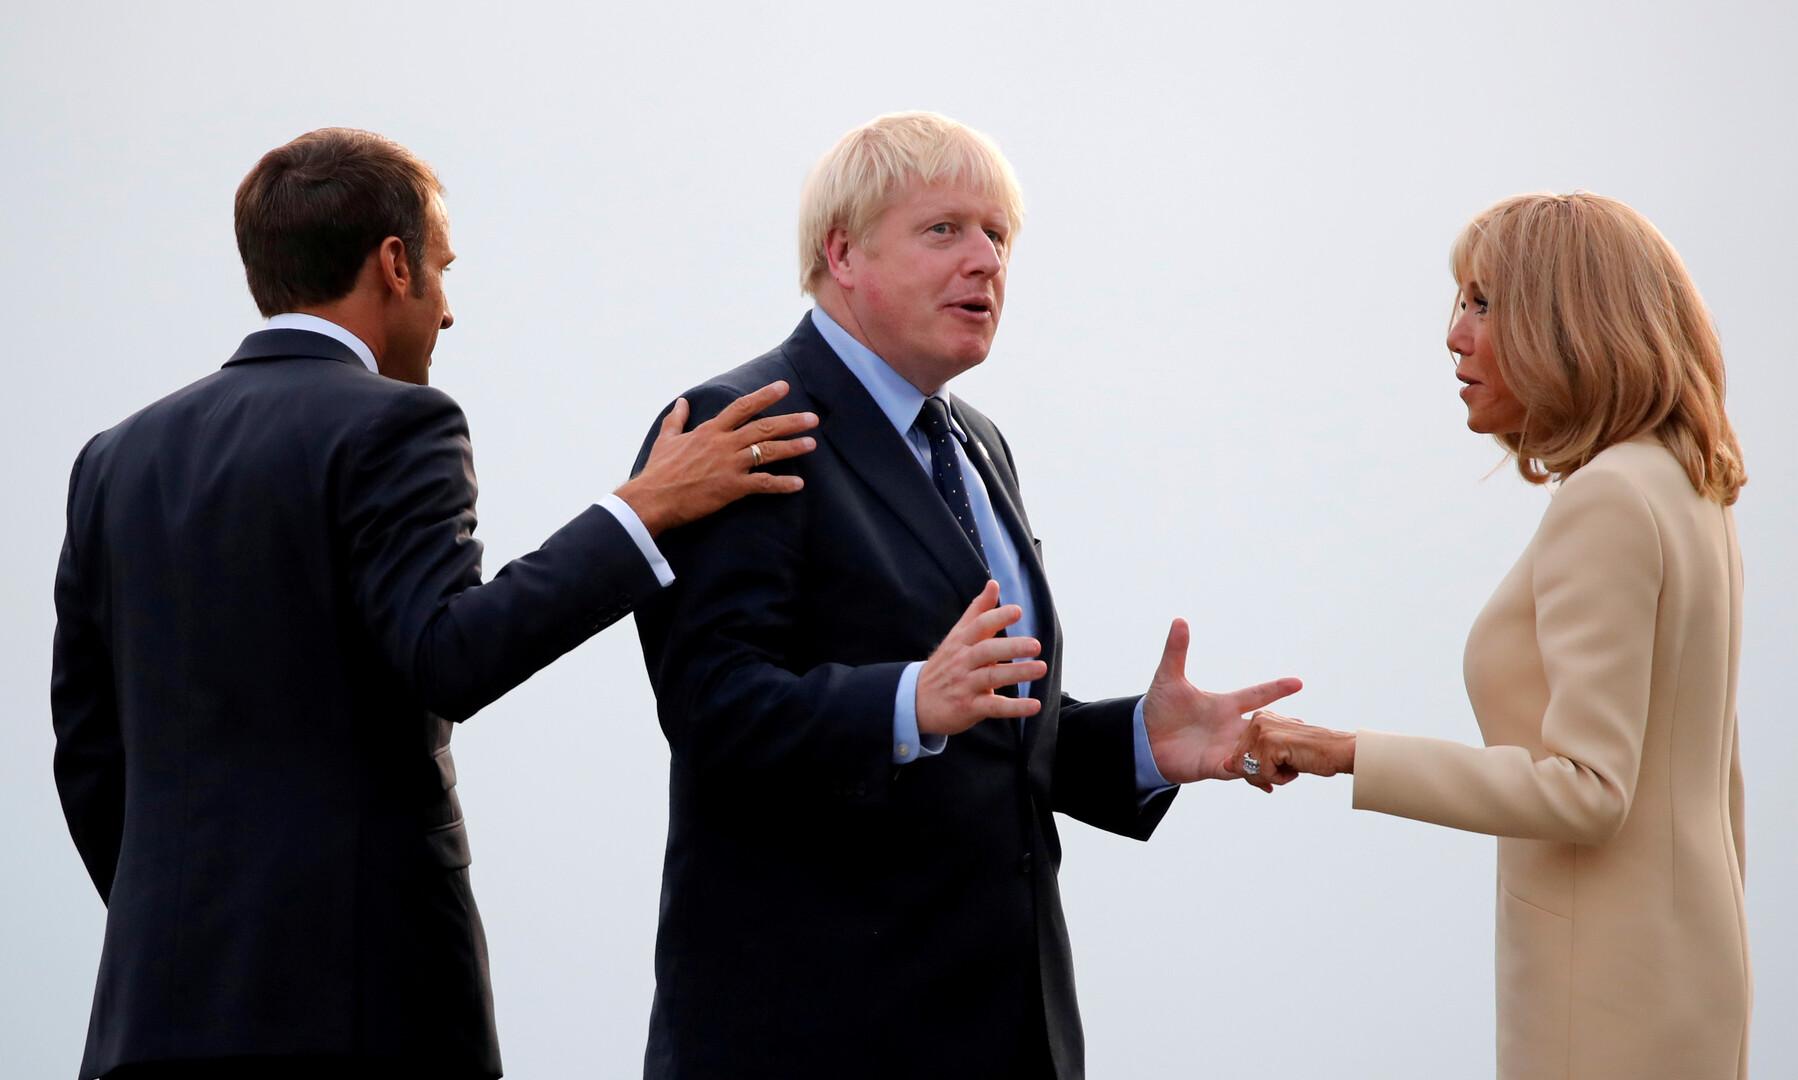 Image result for ماكرون يطالب جونسون بتوضيح موقف بريطانيا من